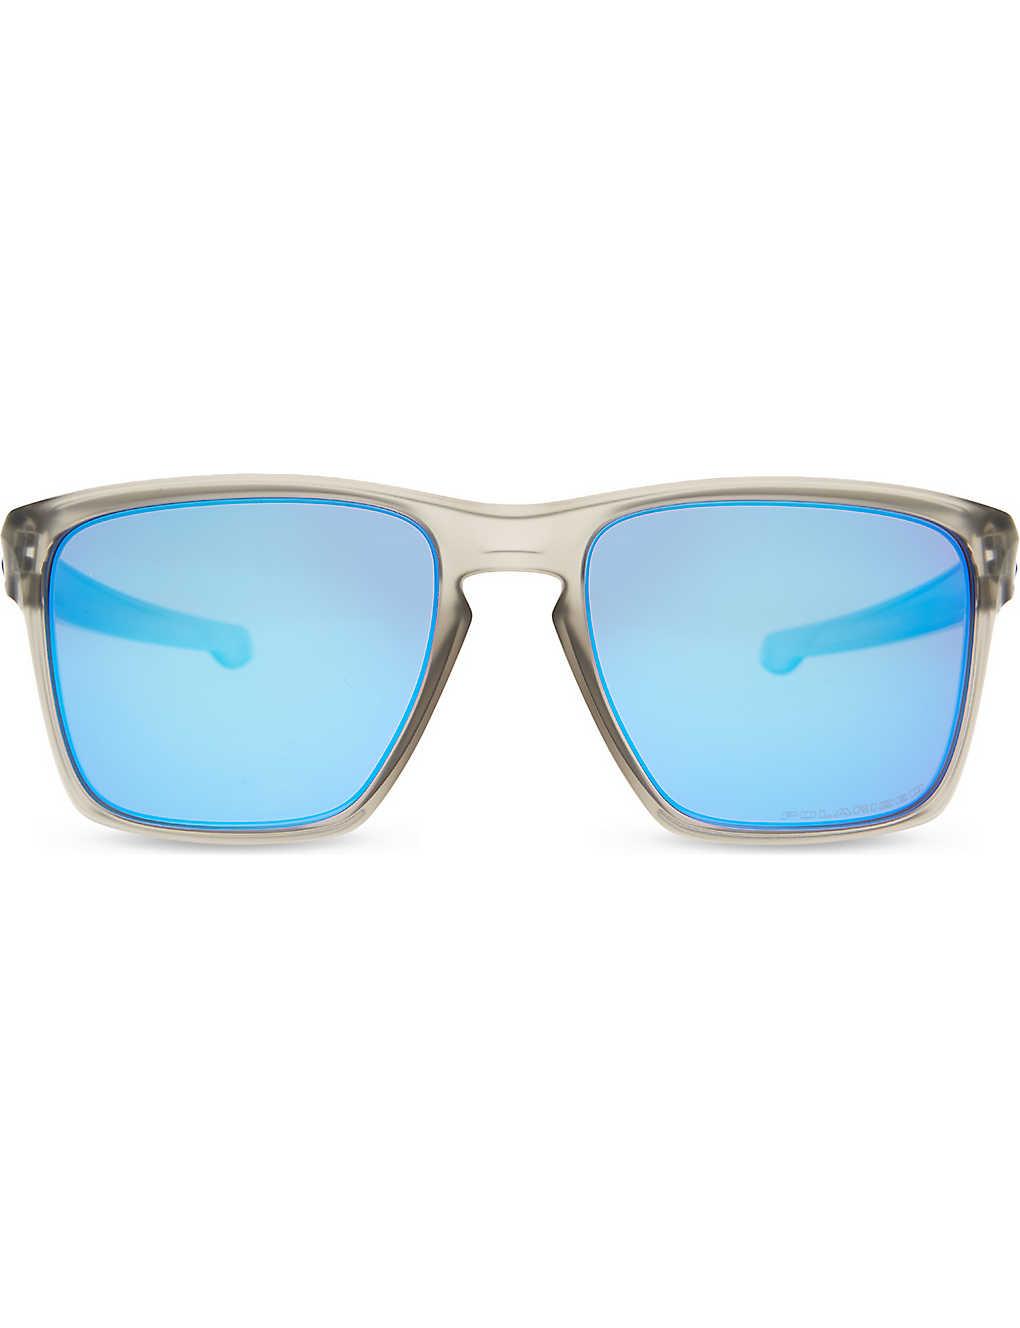 5cc66ed7559d7 OO9341 Sliver XL polarized square-frame sunglasses - Matte grey ink ...